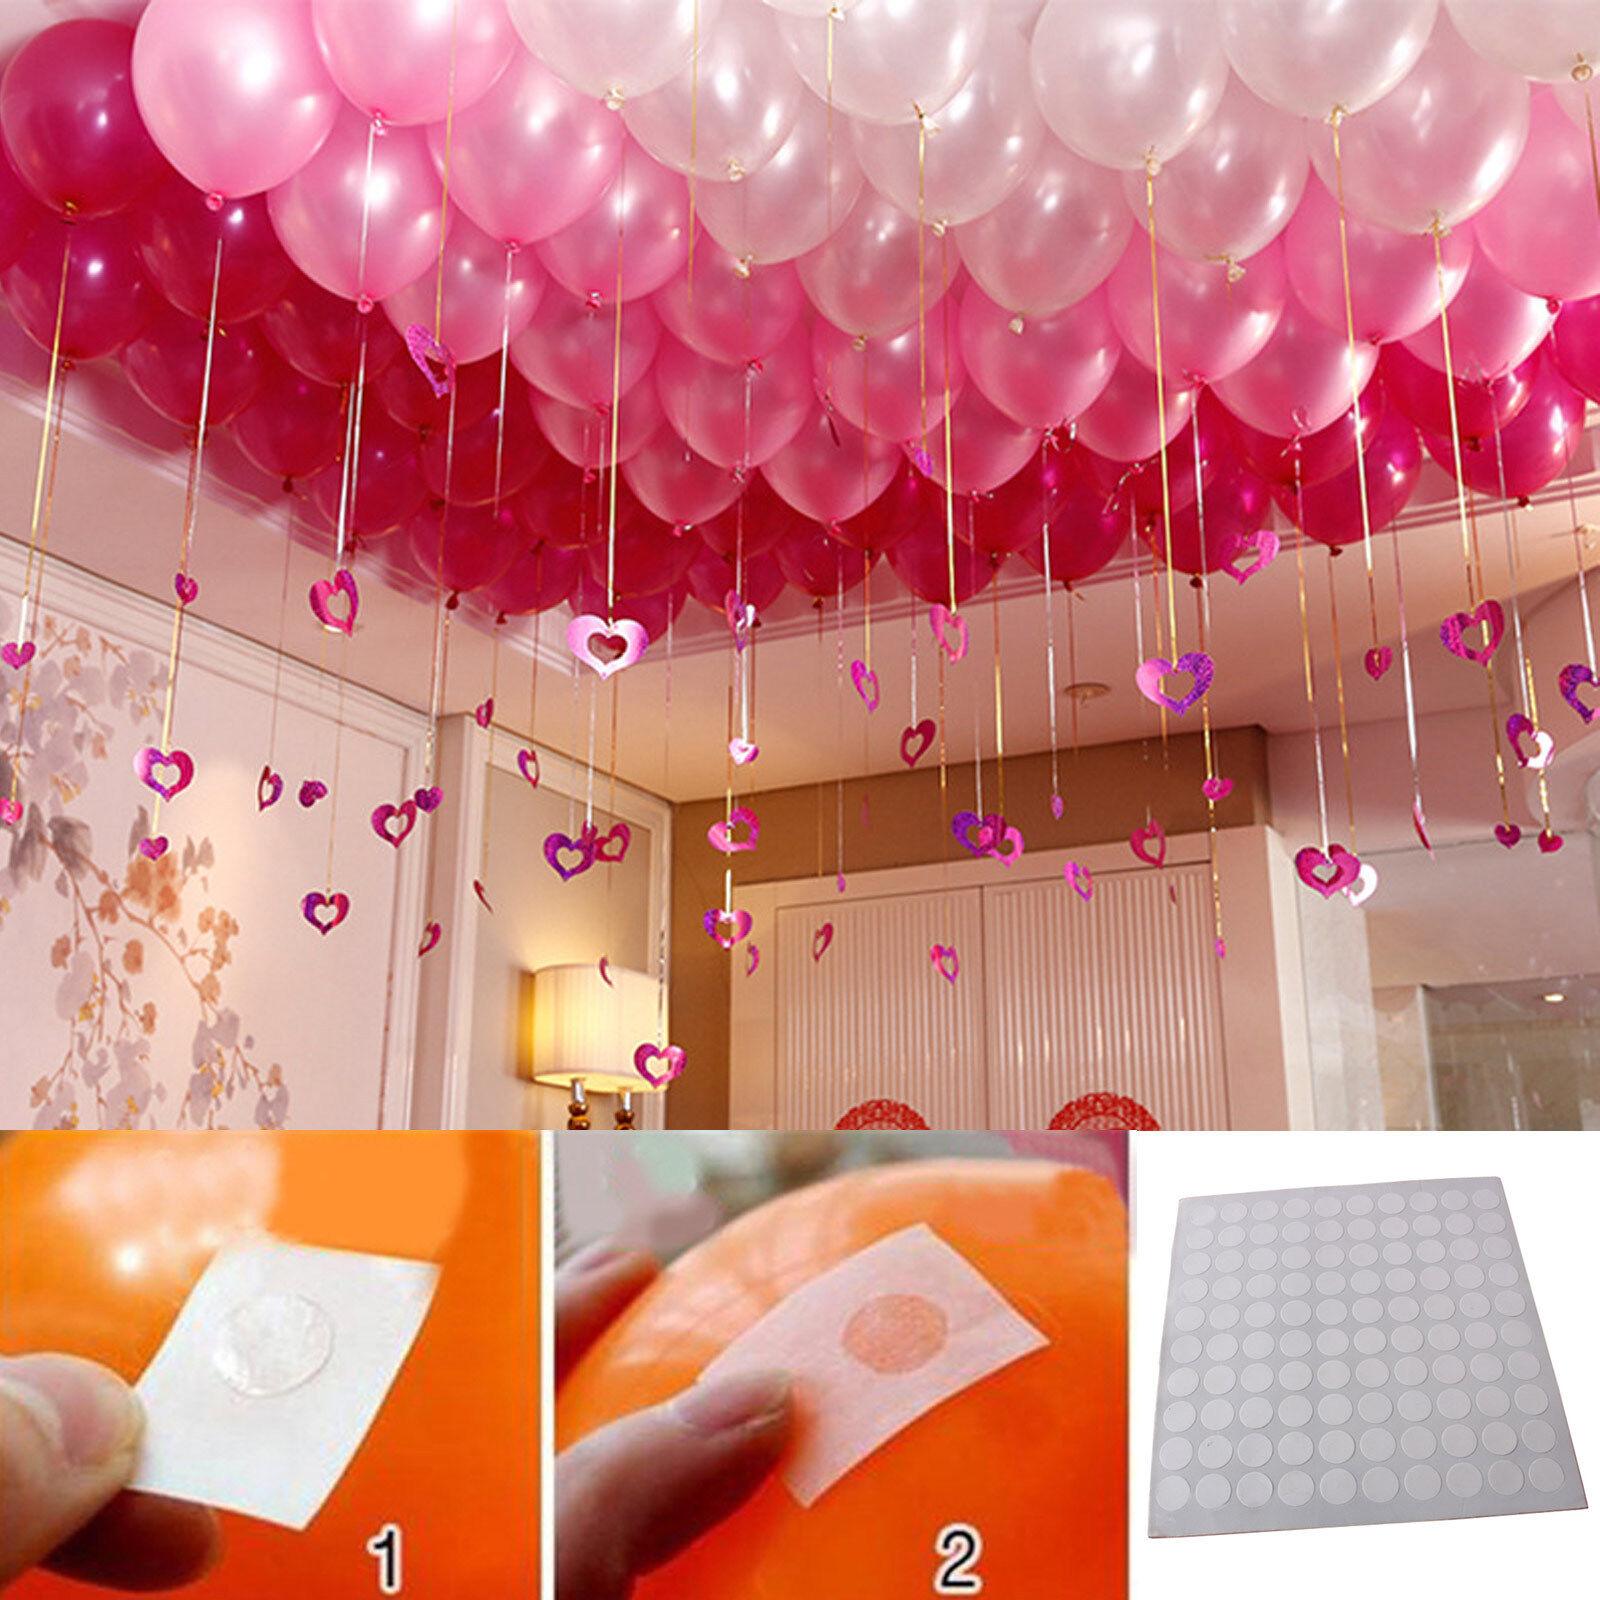 200 Dots Air Balloon Glue Permanent Sticker Removable Xmas Birthday Party Decor